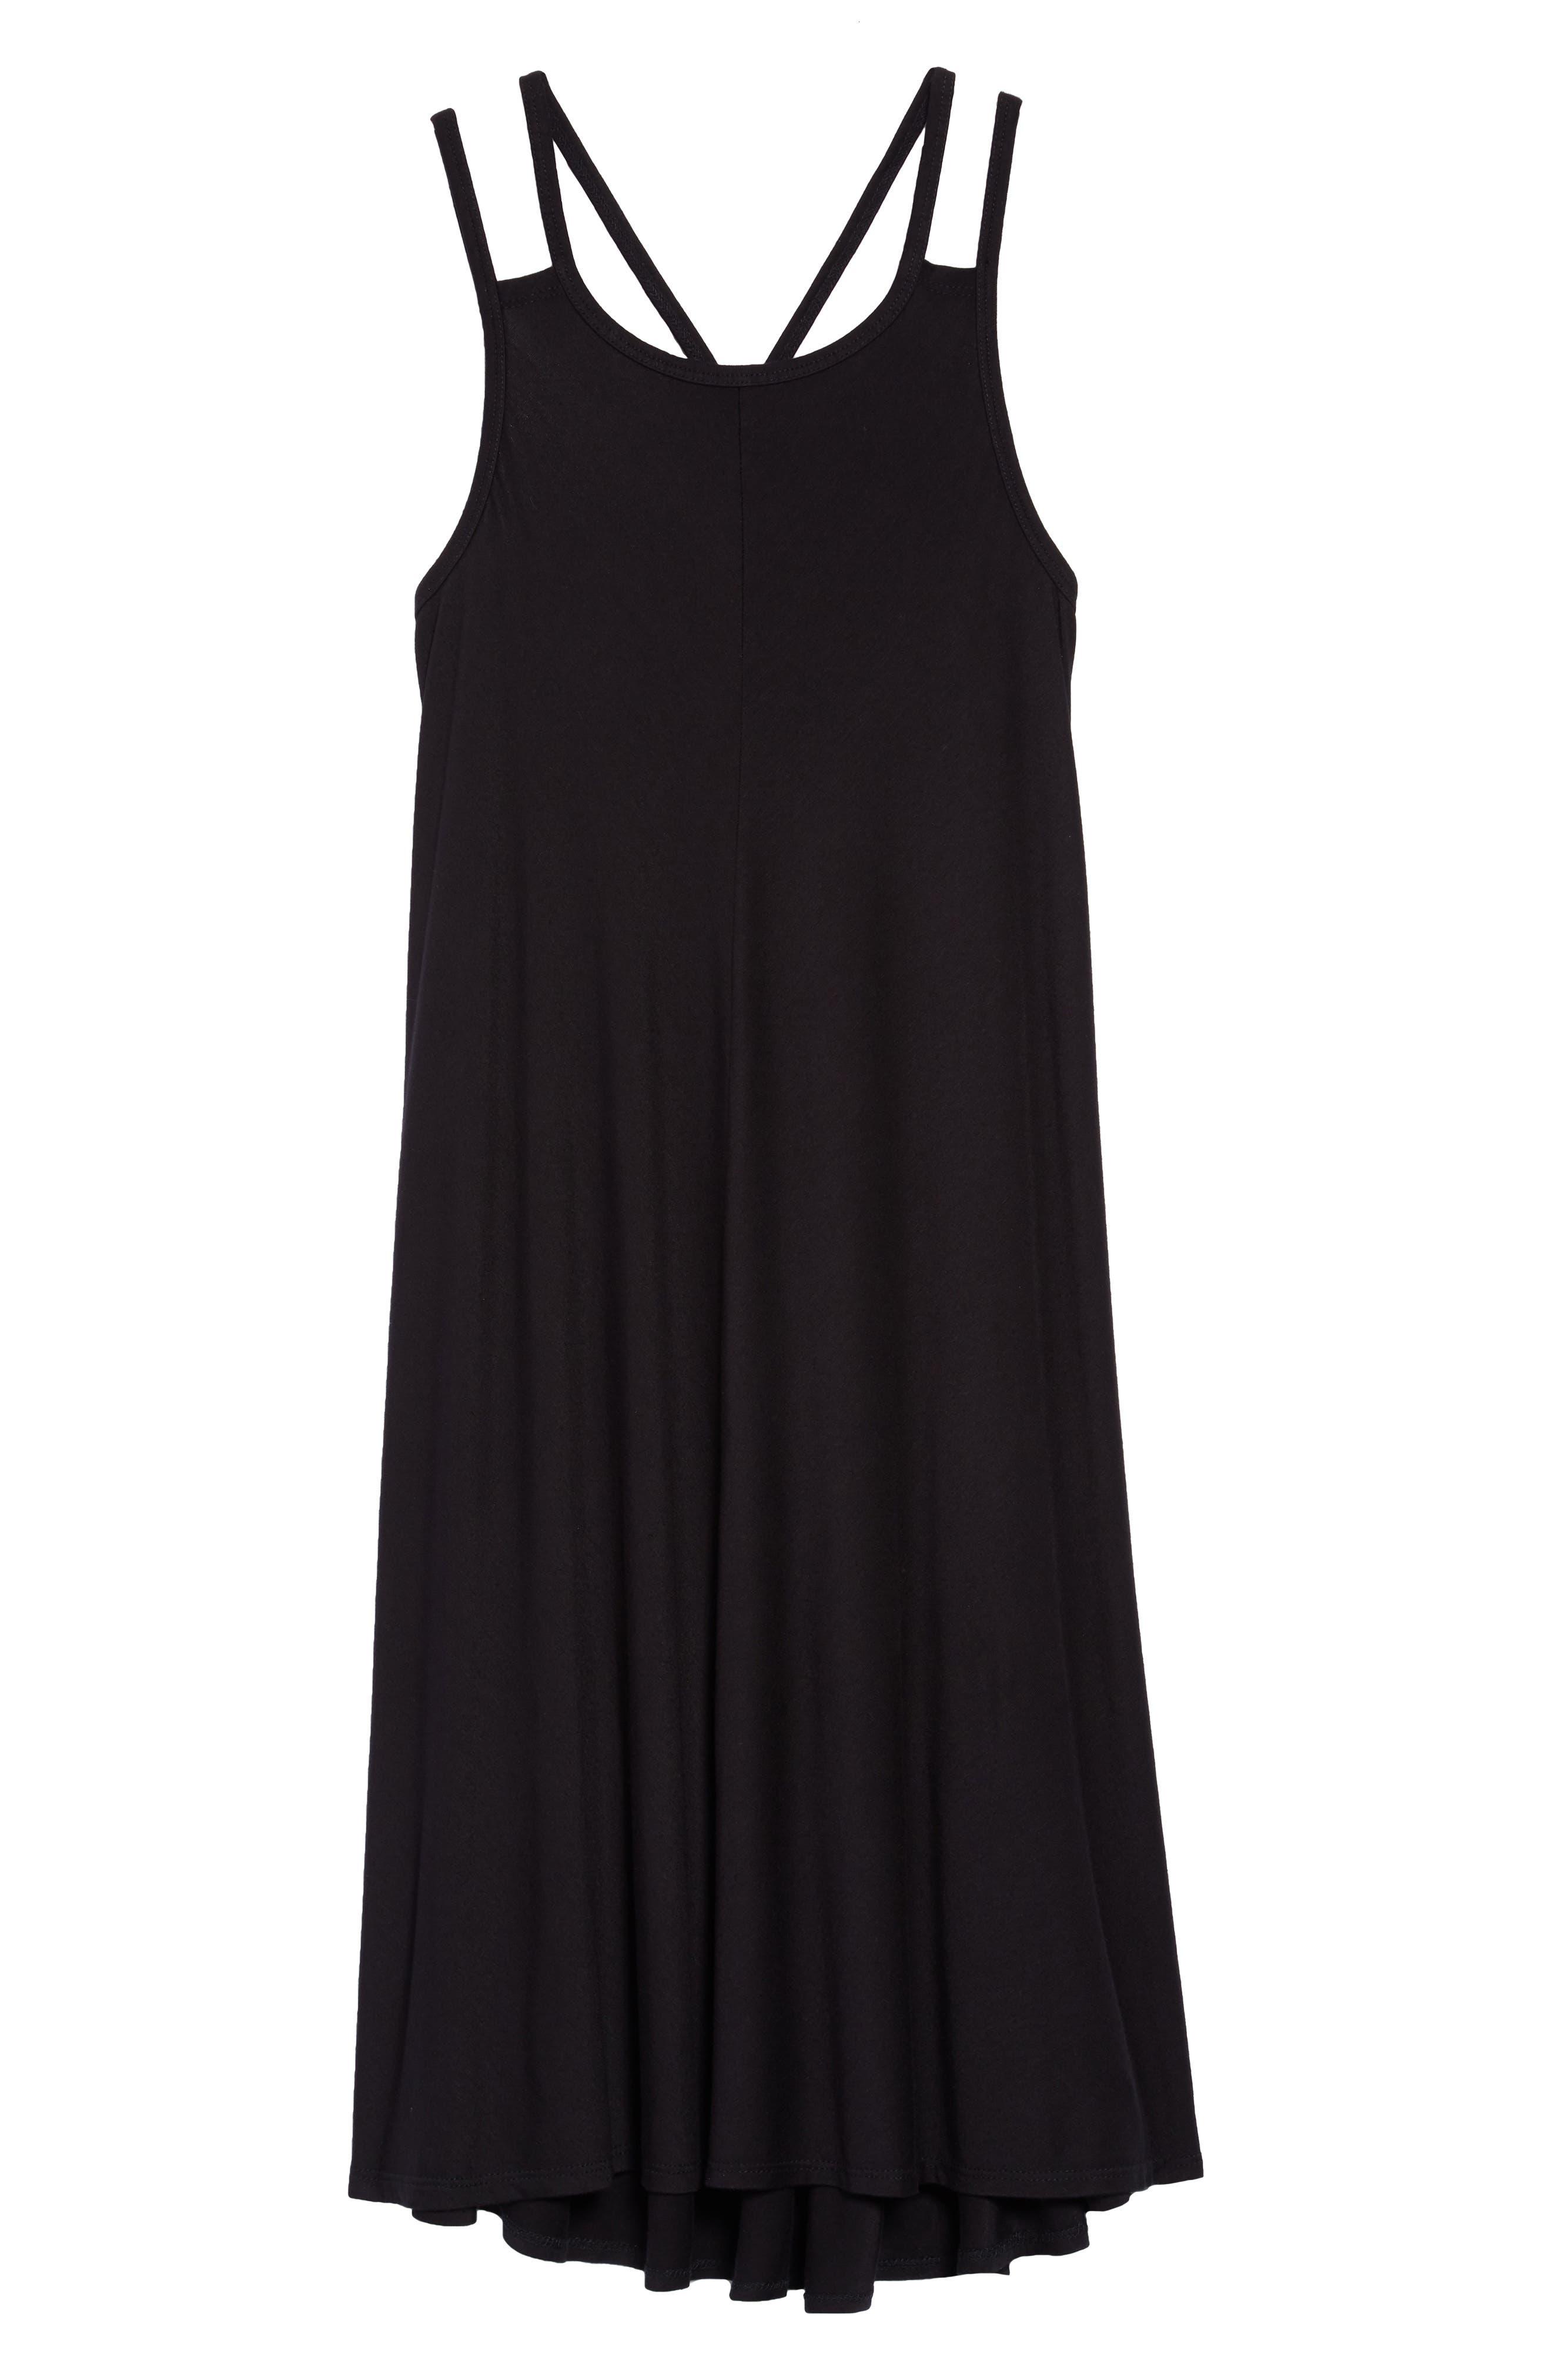 Strappy Dress,                             Main thumbnail 1, color,                             Black